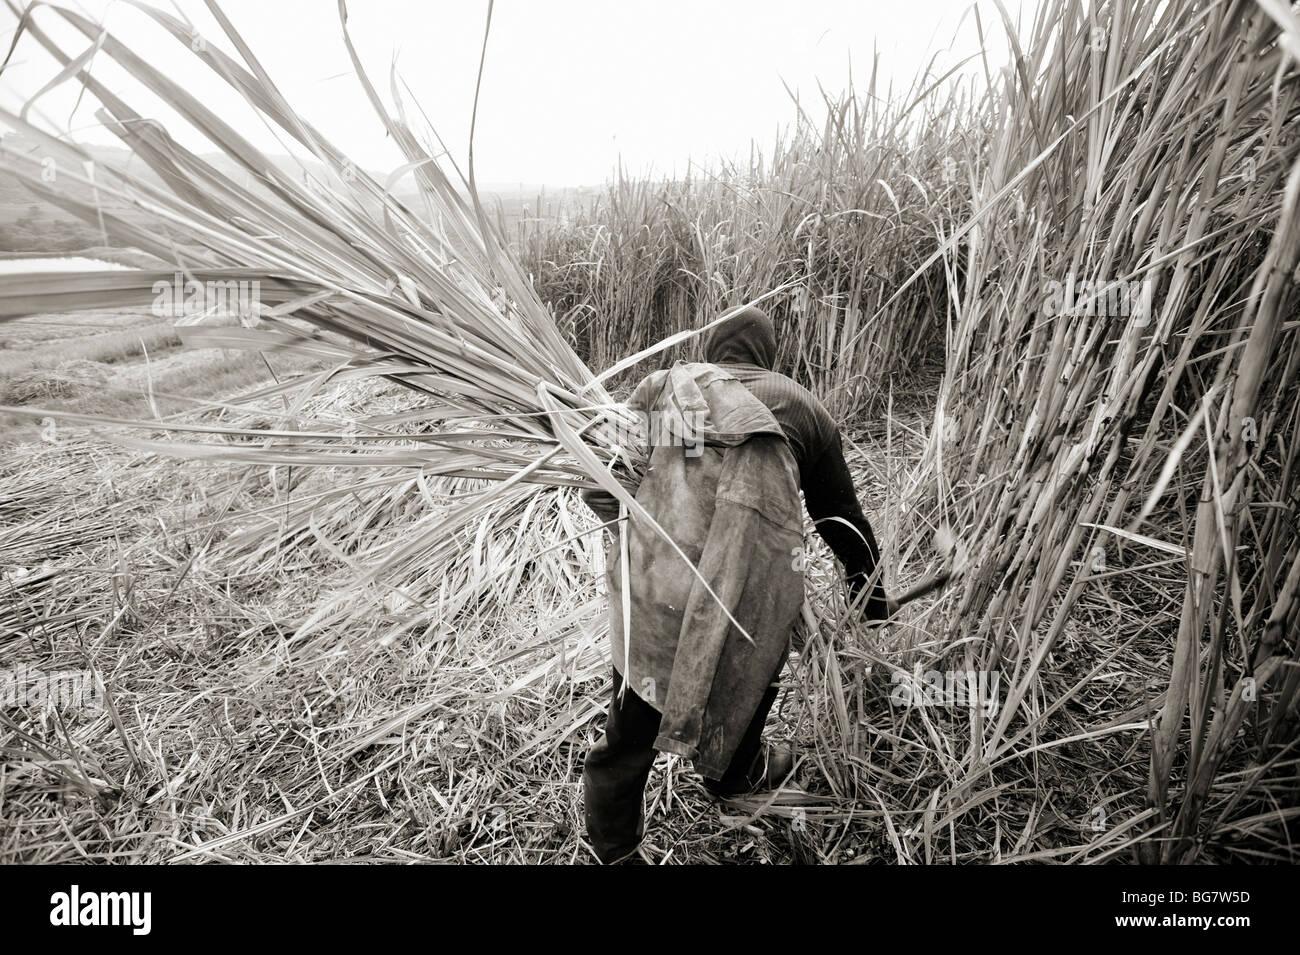 Sugar cane cutter. Sugar cane farm. South of Durban, South Africa - Stock Image